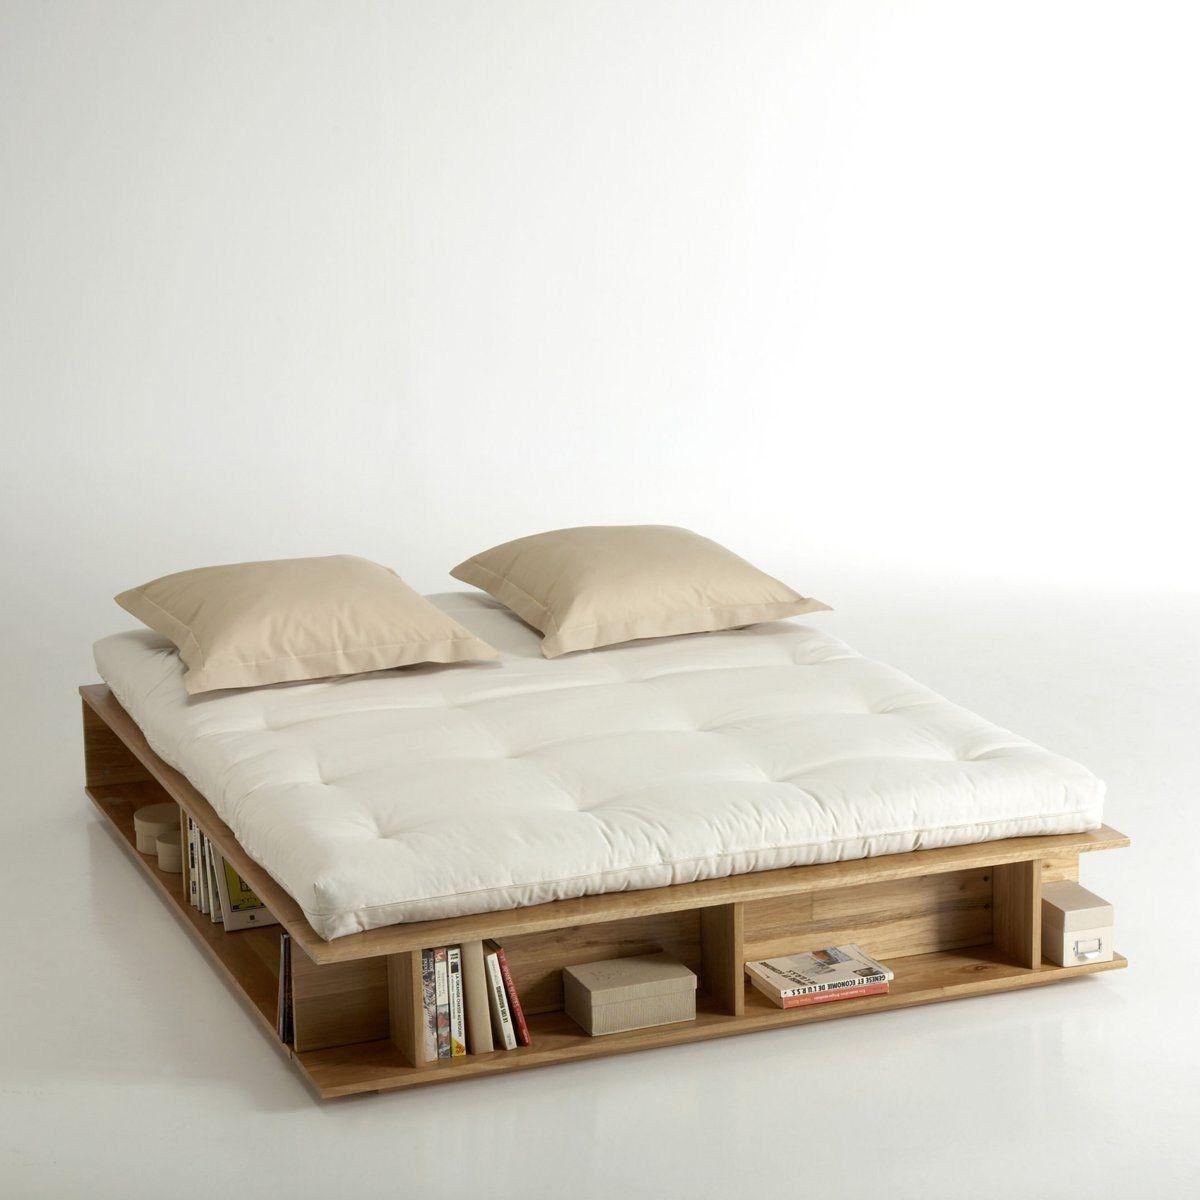 lit rangement sommier relevable pin presto autre pieces of furniture pinterest lit. Black Bedroom Furniture Sets. Home Design Ideas